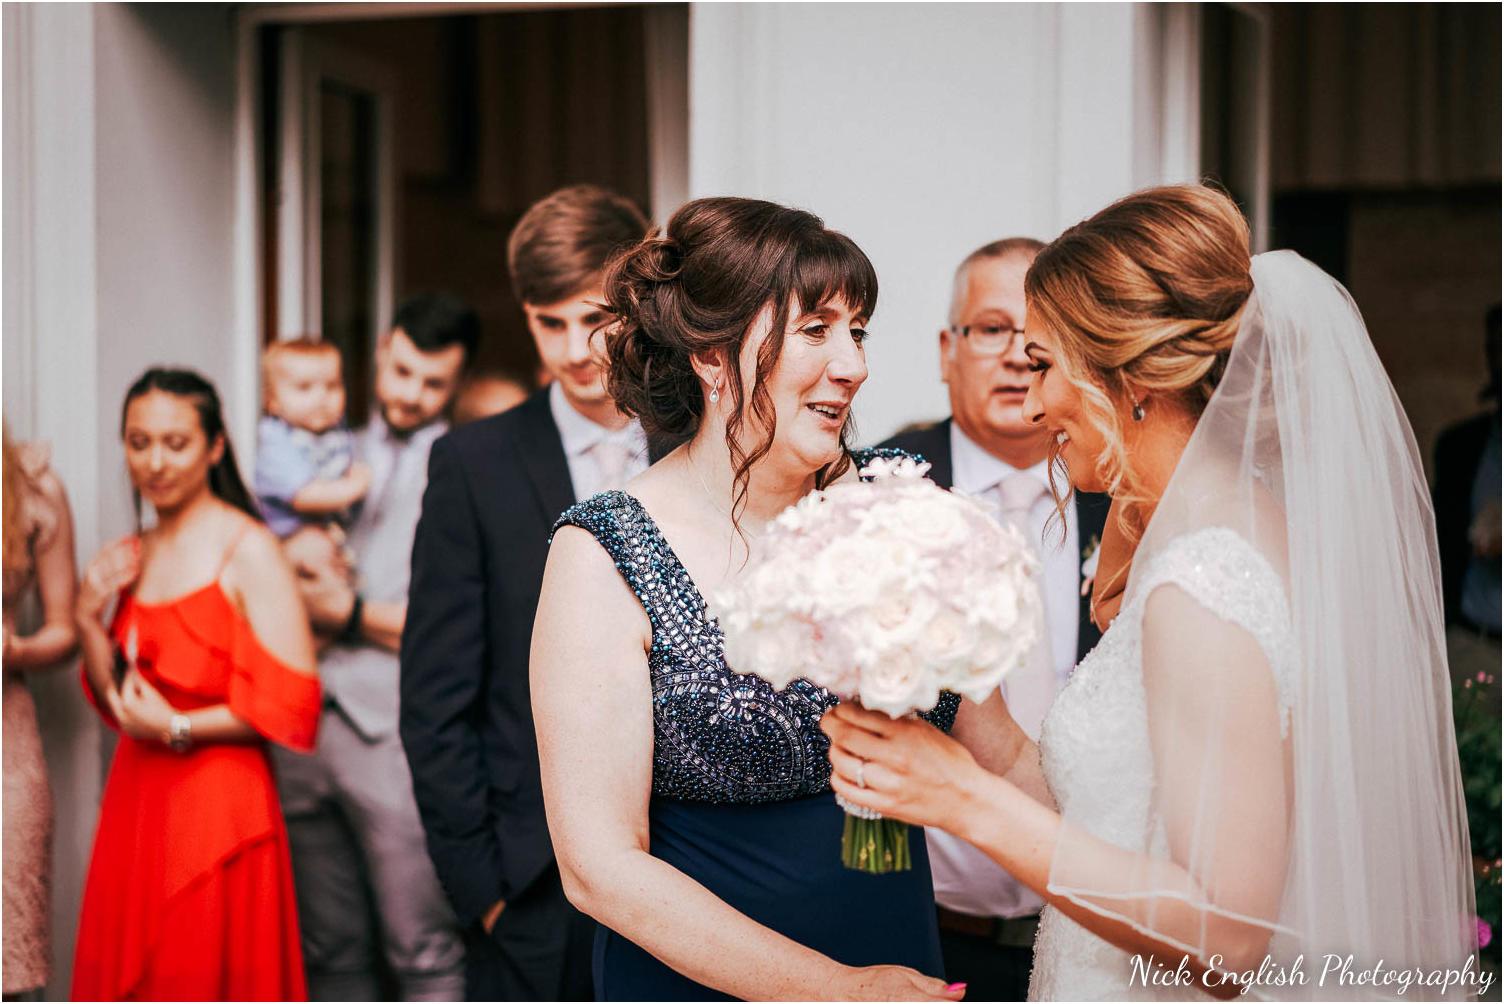 Destination_Wedding_Photographer_Slovenia_Nick_English_Photography-51.jpg